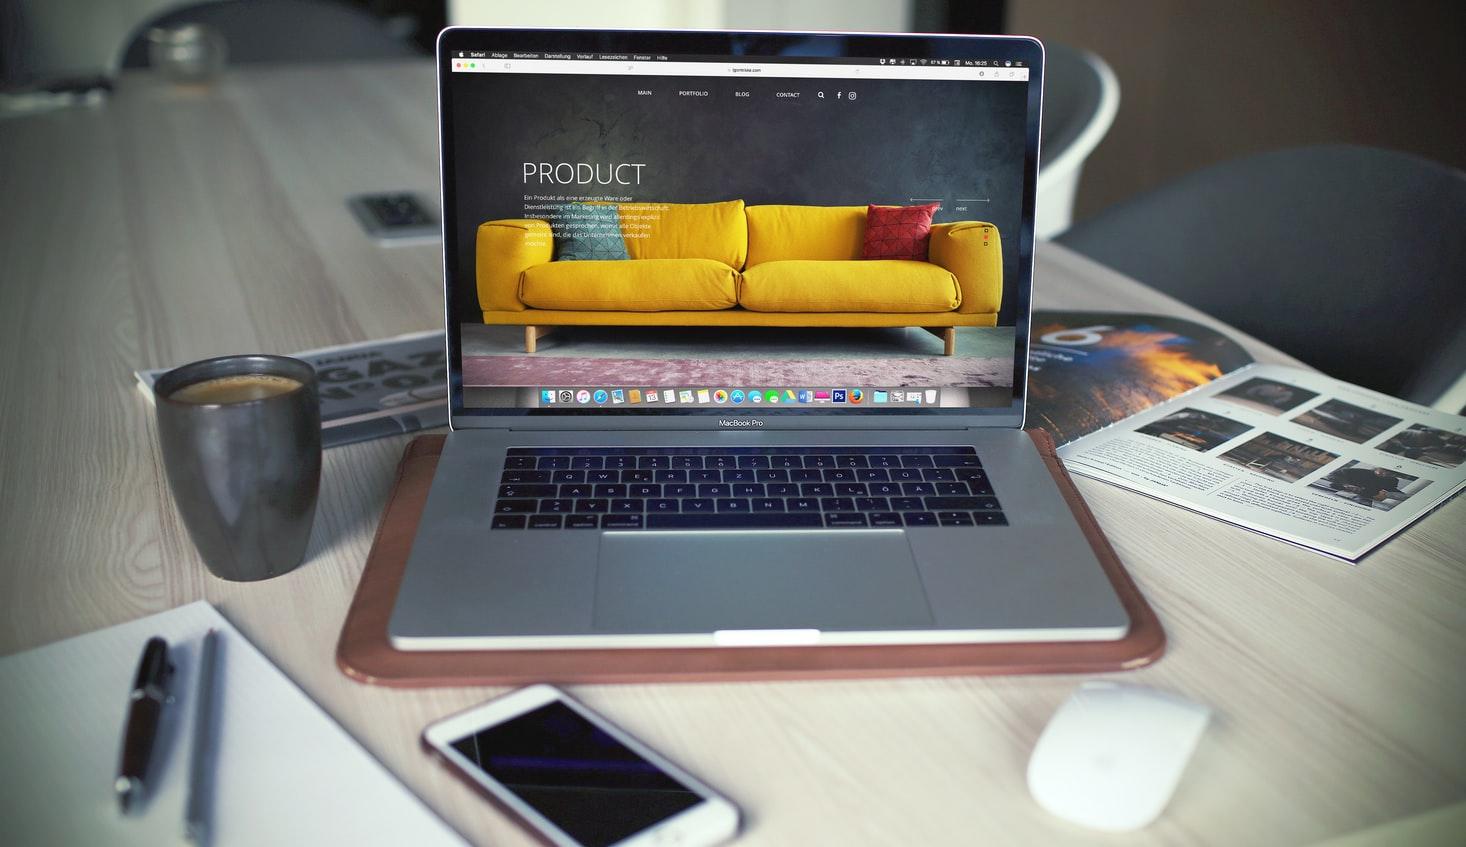 macbook yellow sofa